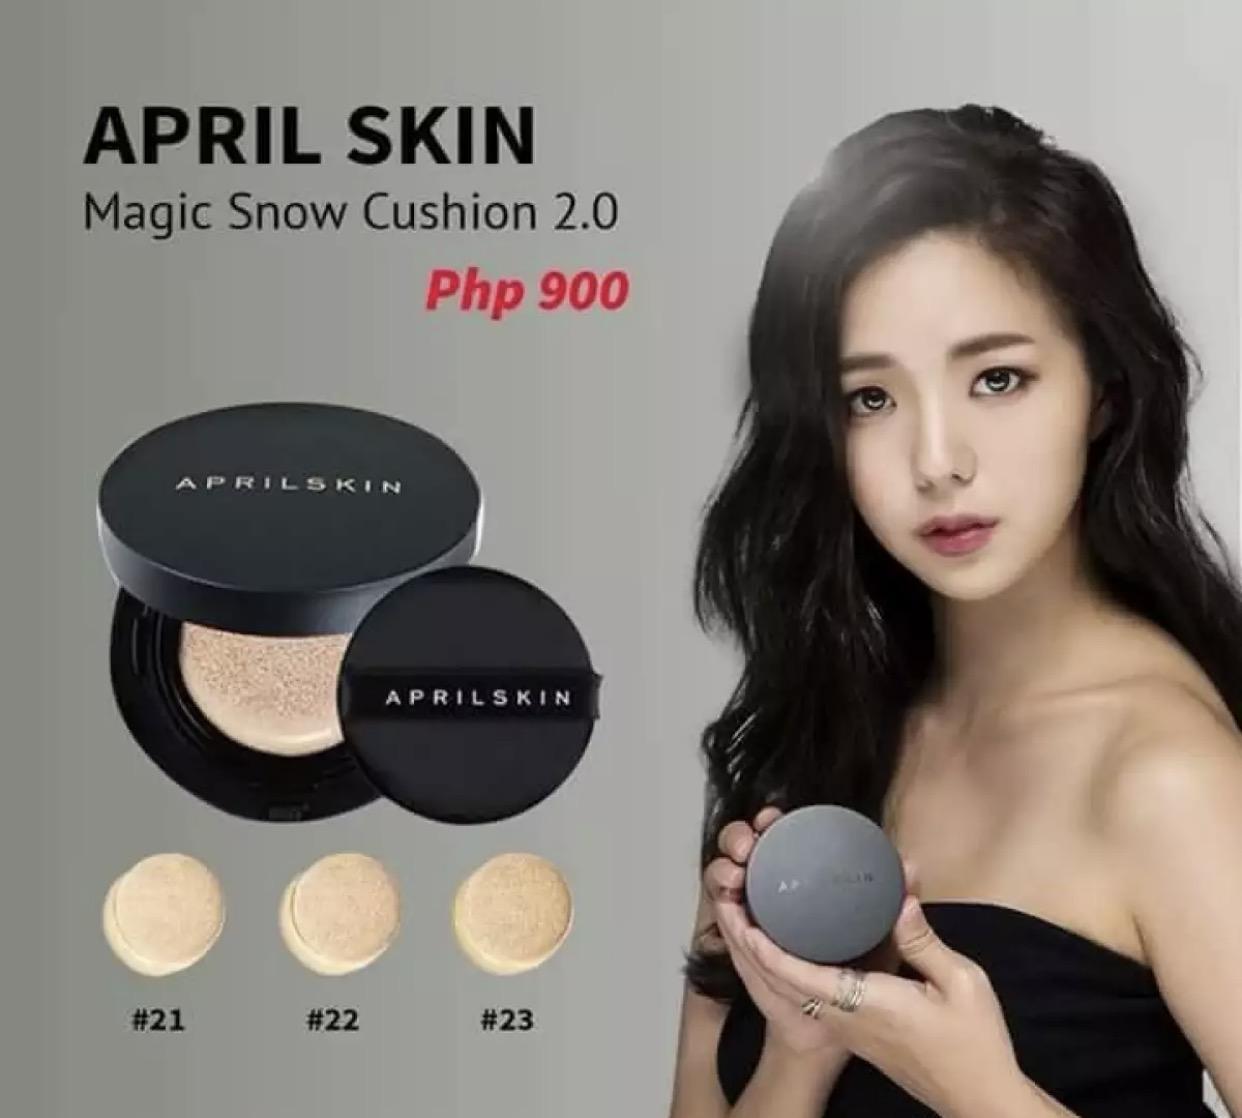 Aprilskin Black Magic Snow Cushion April Skin Philippines